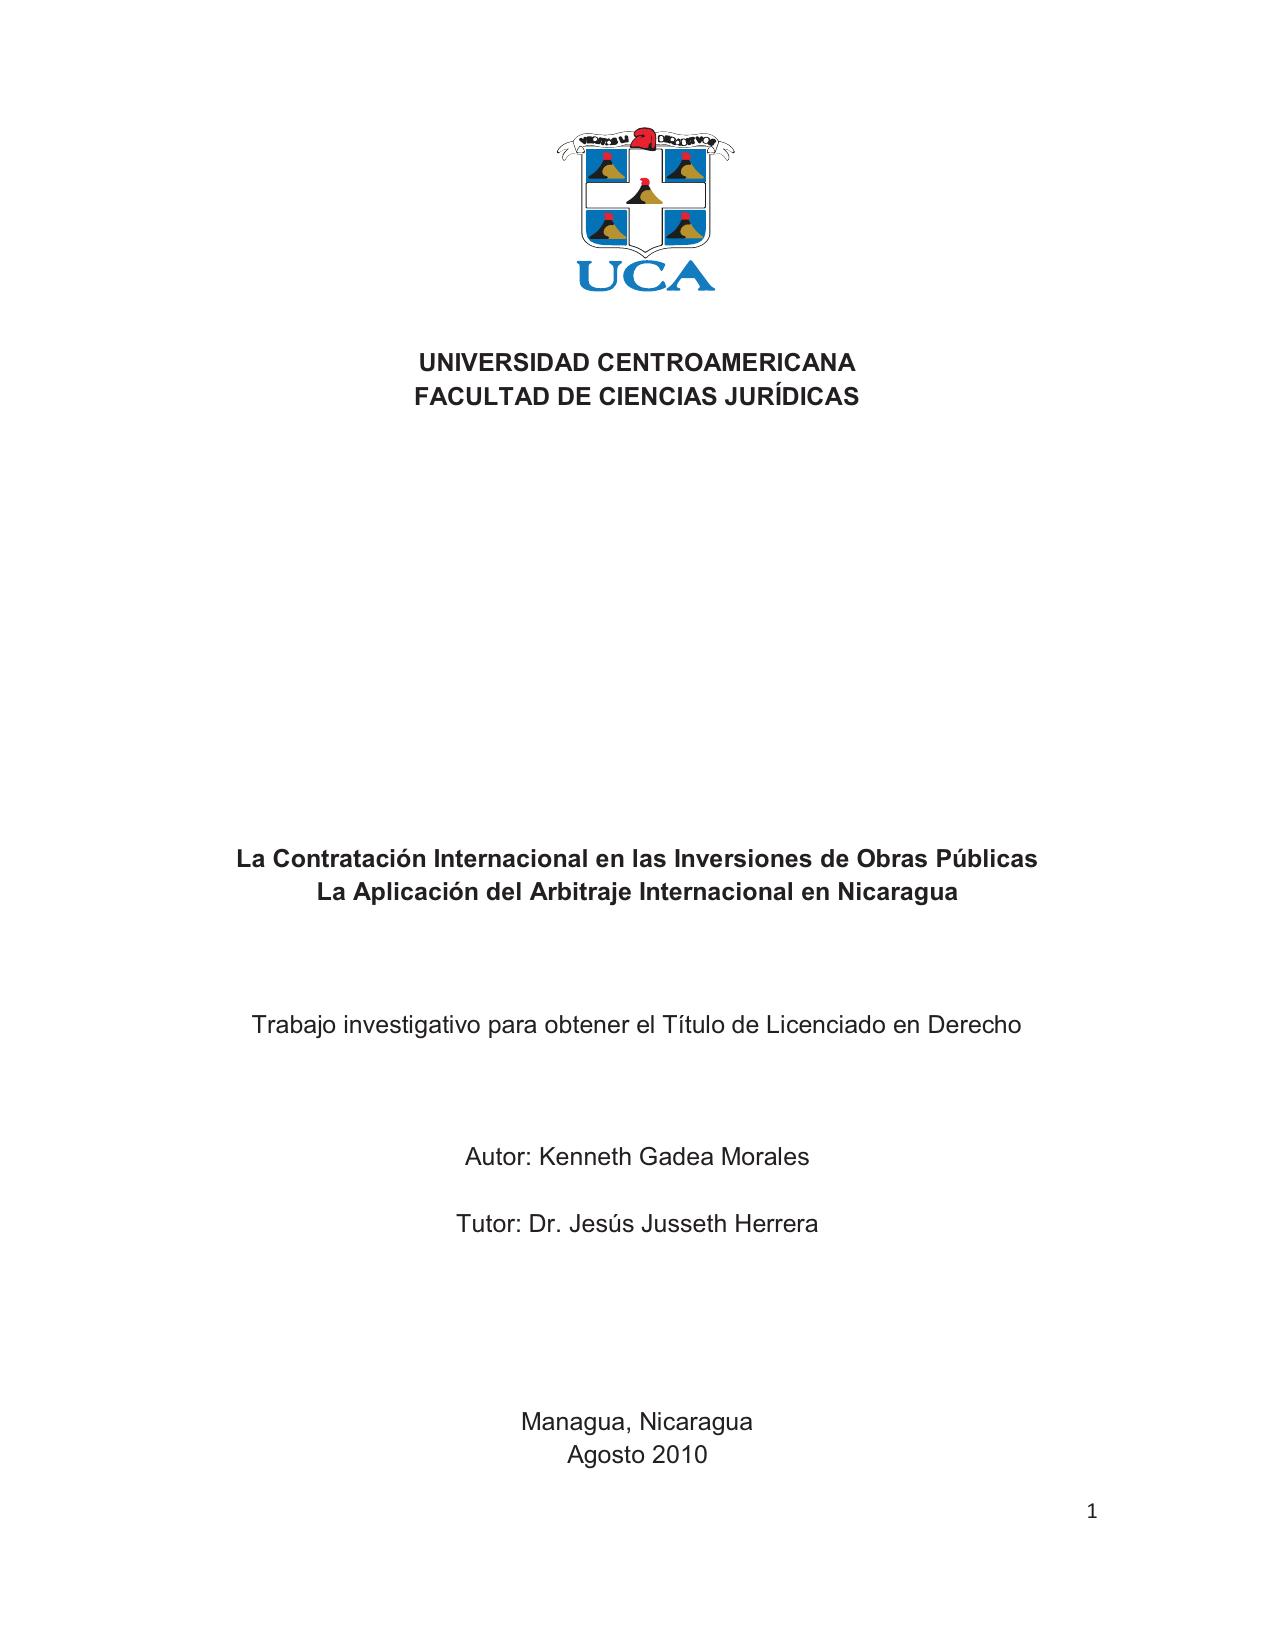 Repositorio Institucional | manualzz.com